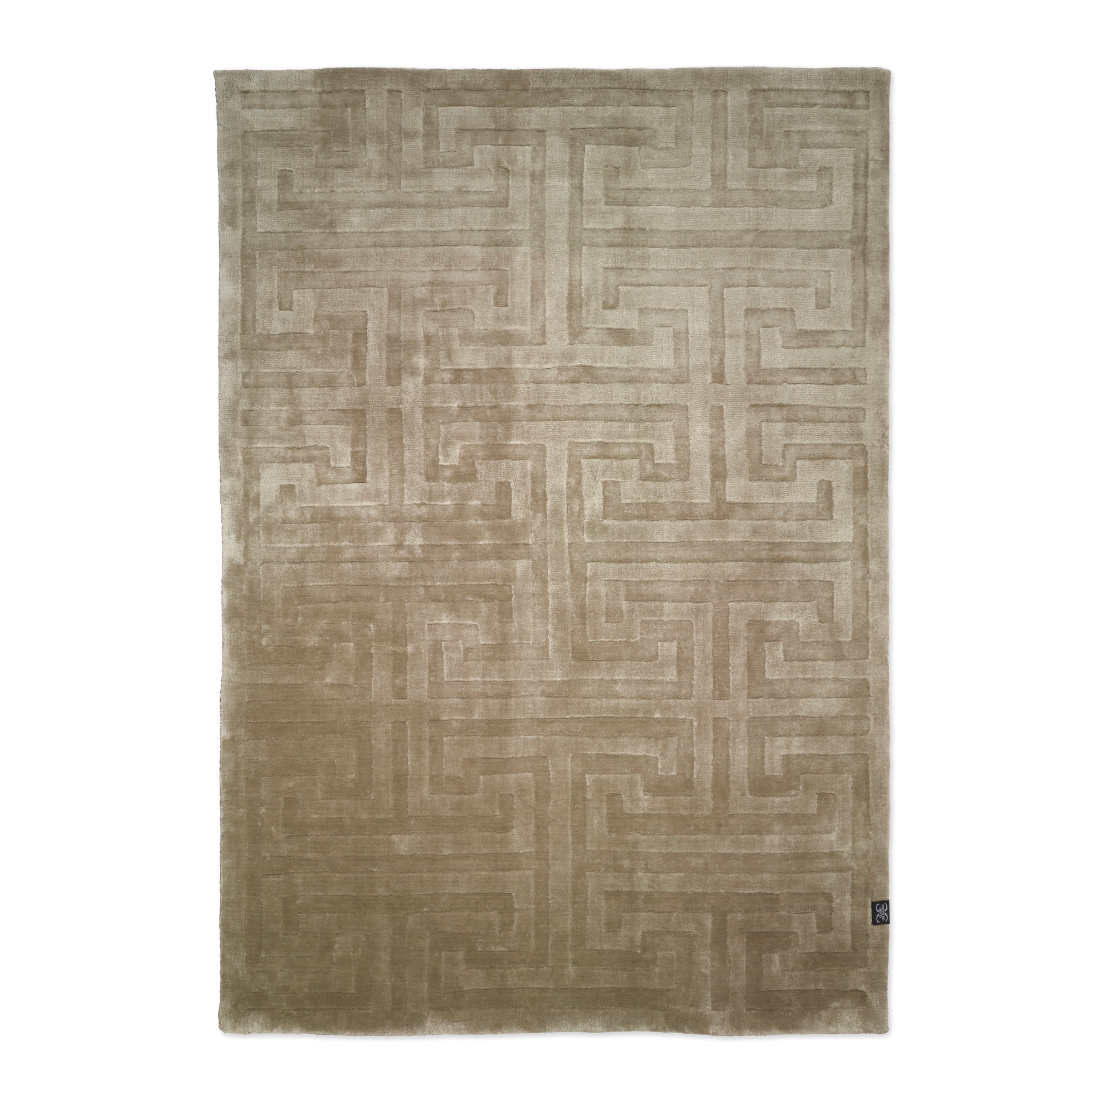 Viskosmatta KEY taupe 250 x 350 cm, Classic Collection